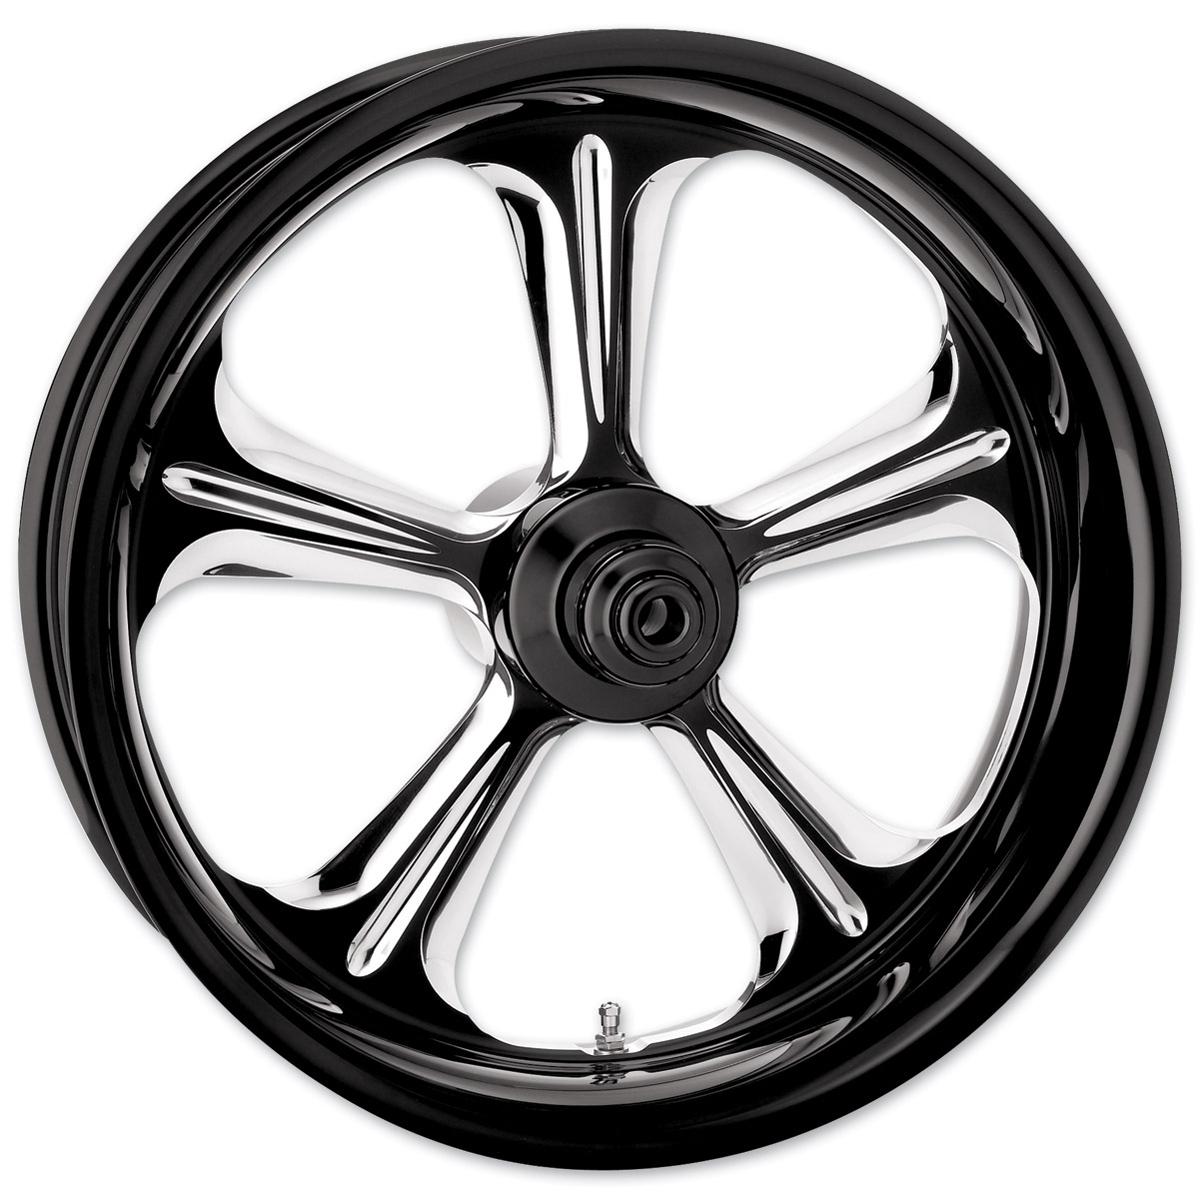 Performance Machine Wrath Platinum Cut Front Wheel 21x2.15 With PM Disc